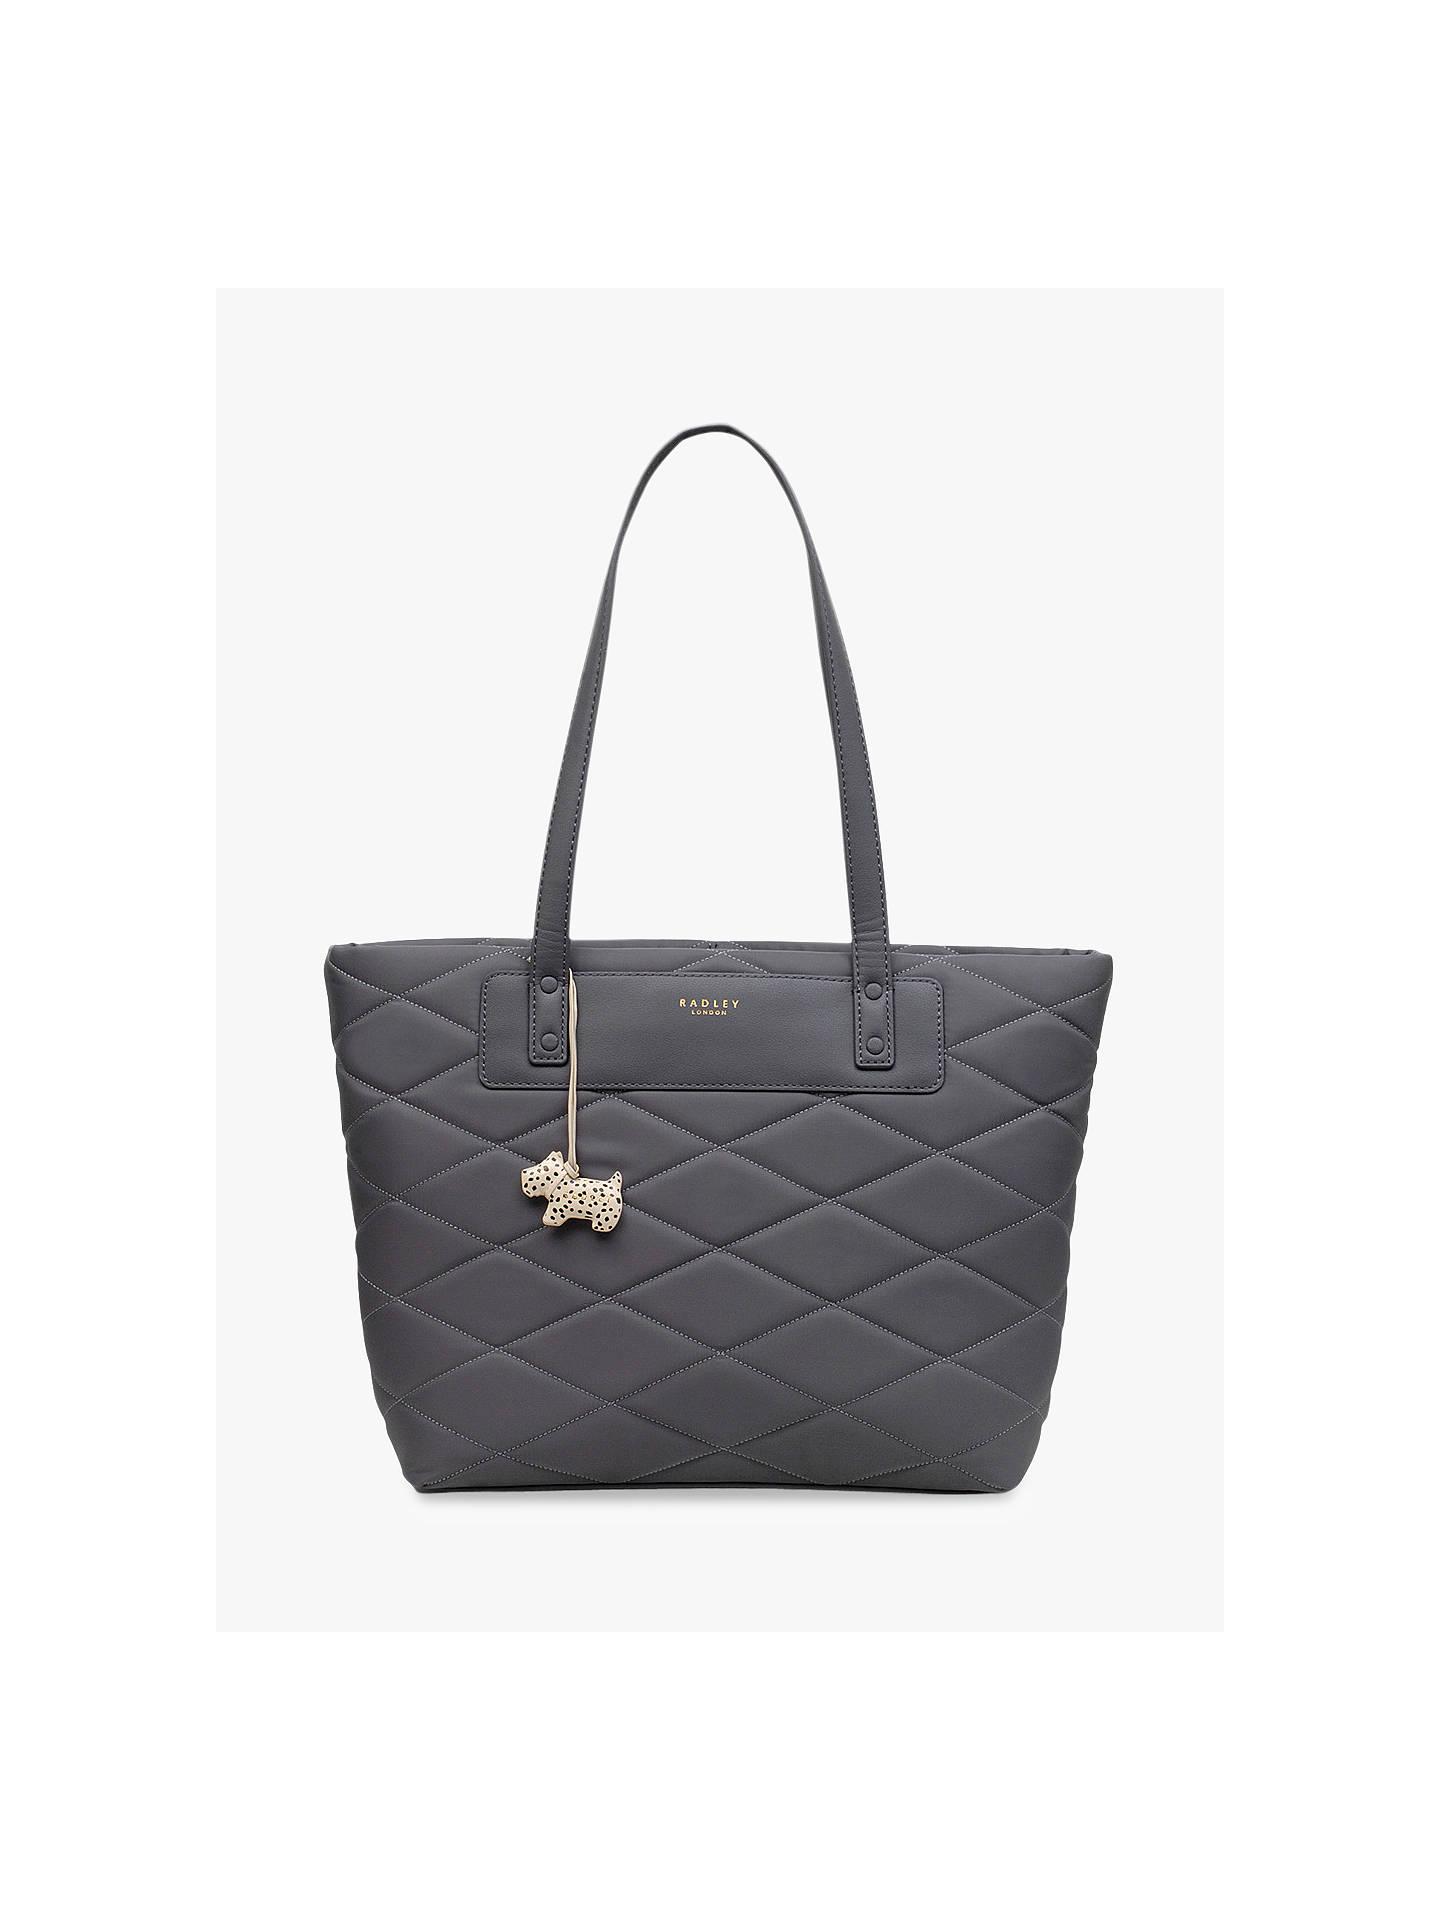 752adcbcef25 Buy Radley Charleston Quilted Fabric Medium Shoulder Bag, Charcoal Online  at johnlewis.com ...